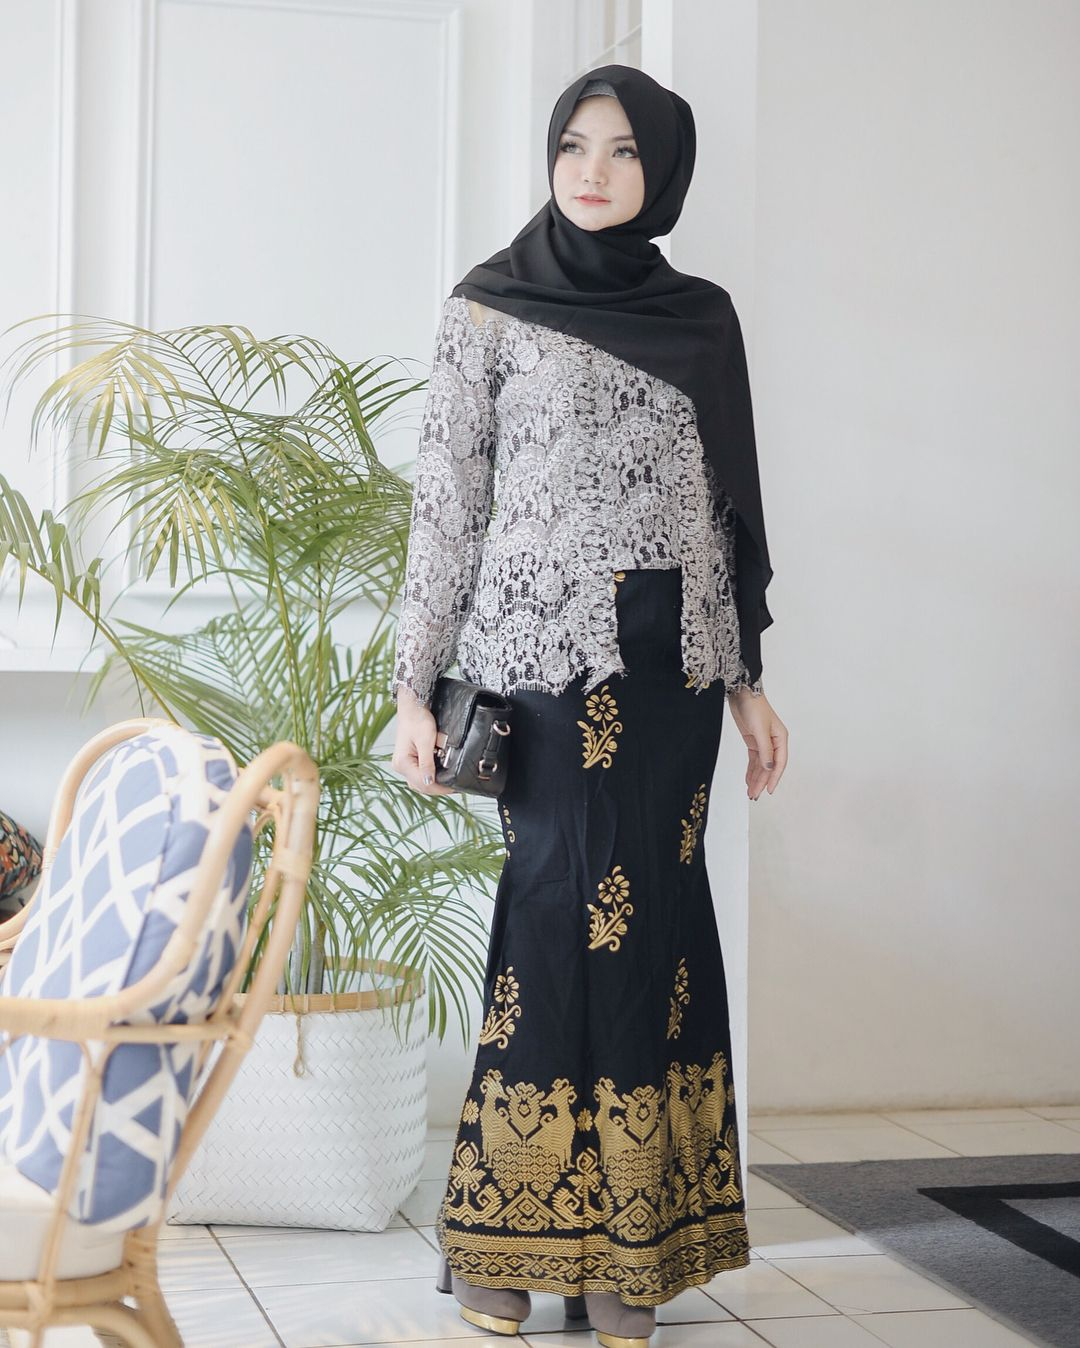 gaya hijabis #gayahijabis   hijab muslimah #hijabmuslimah ...